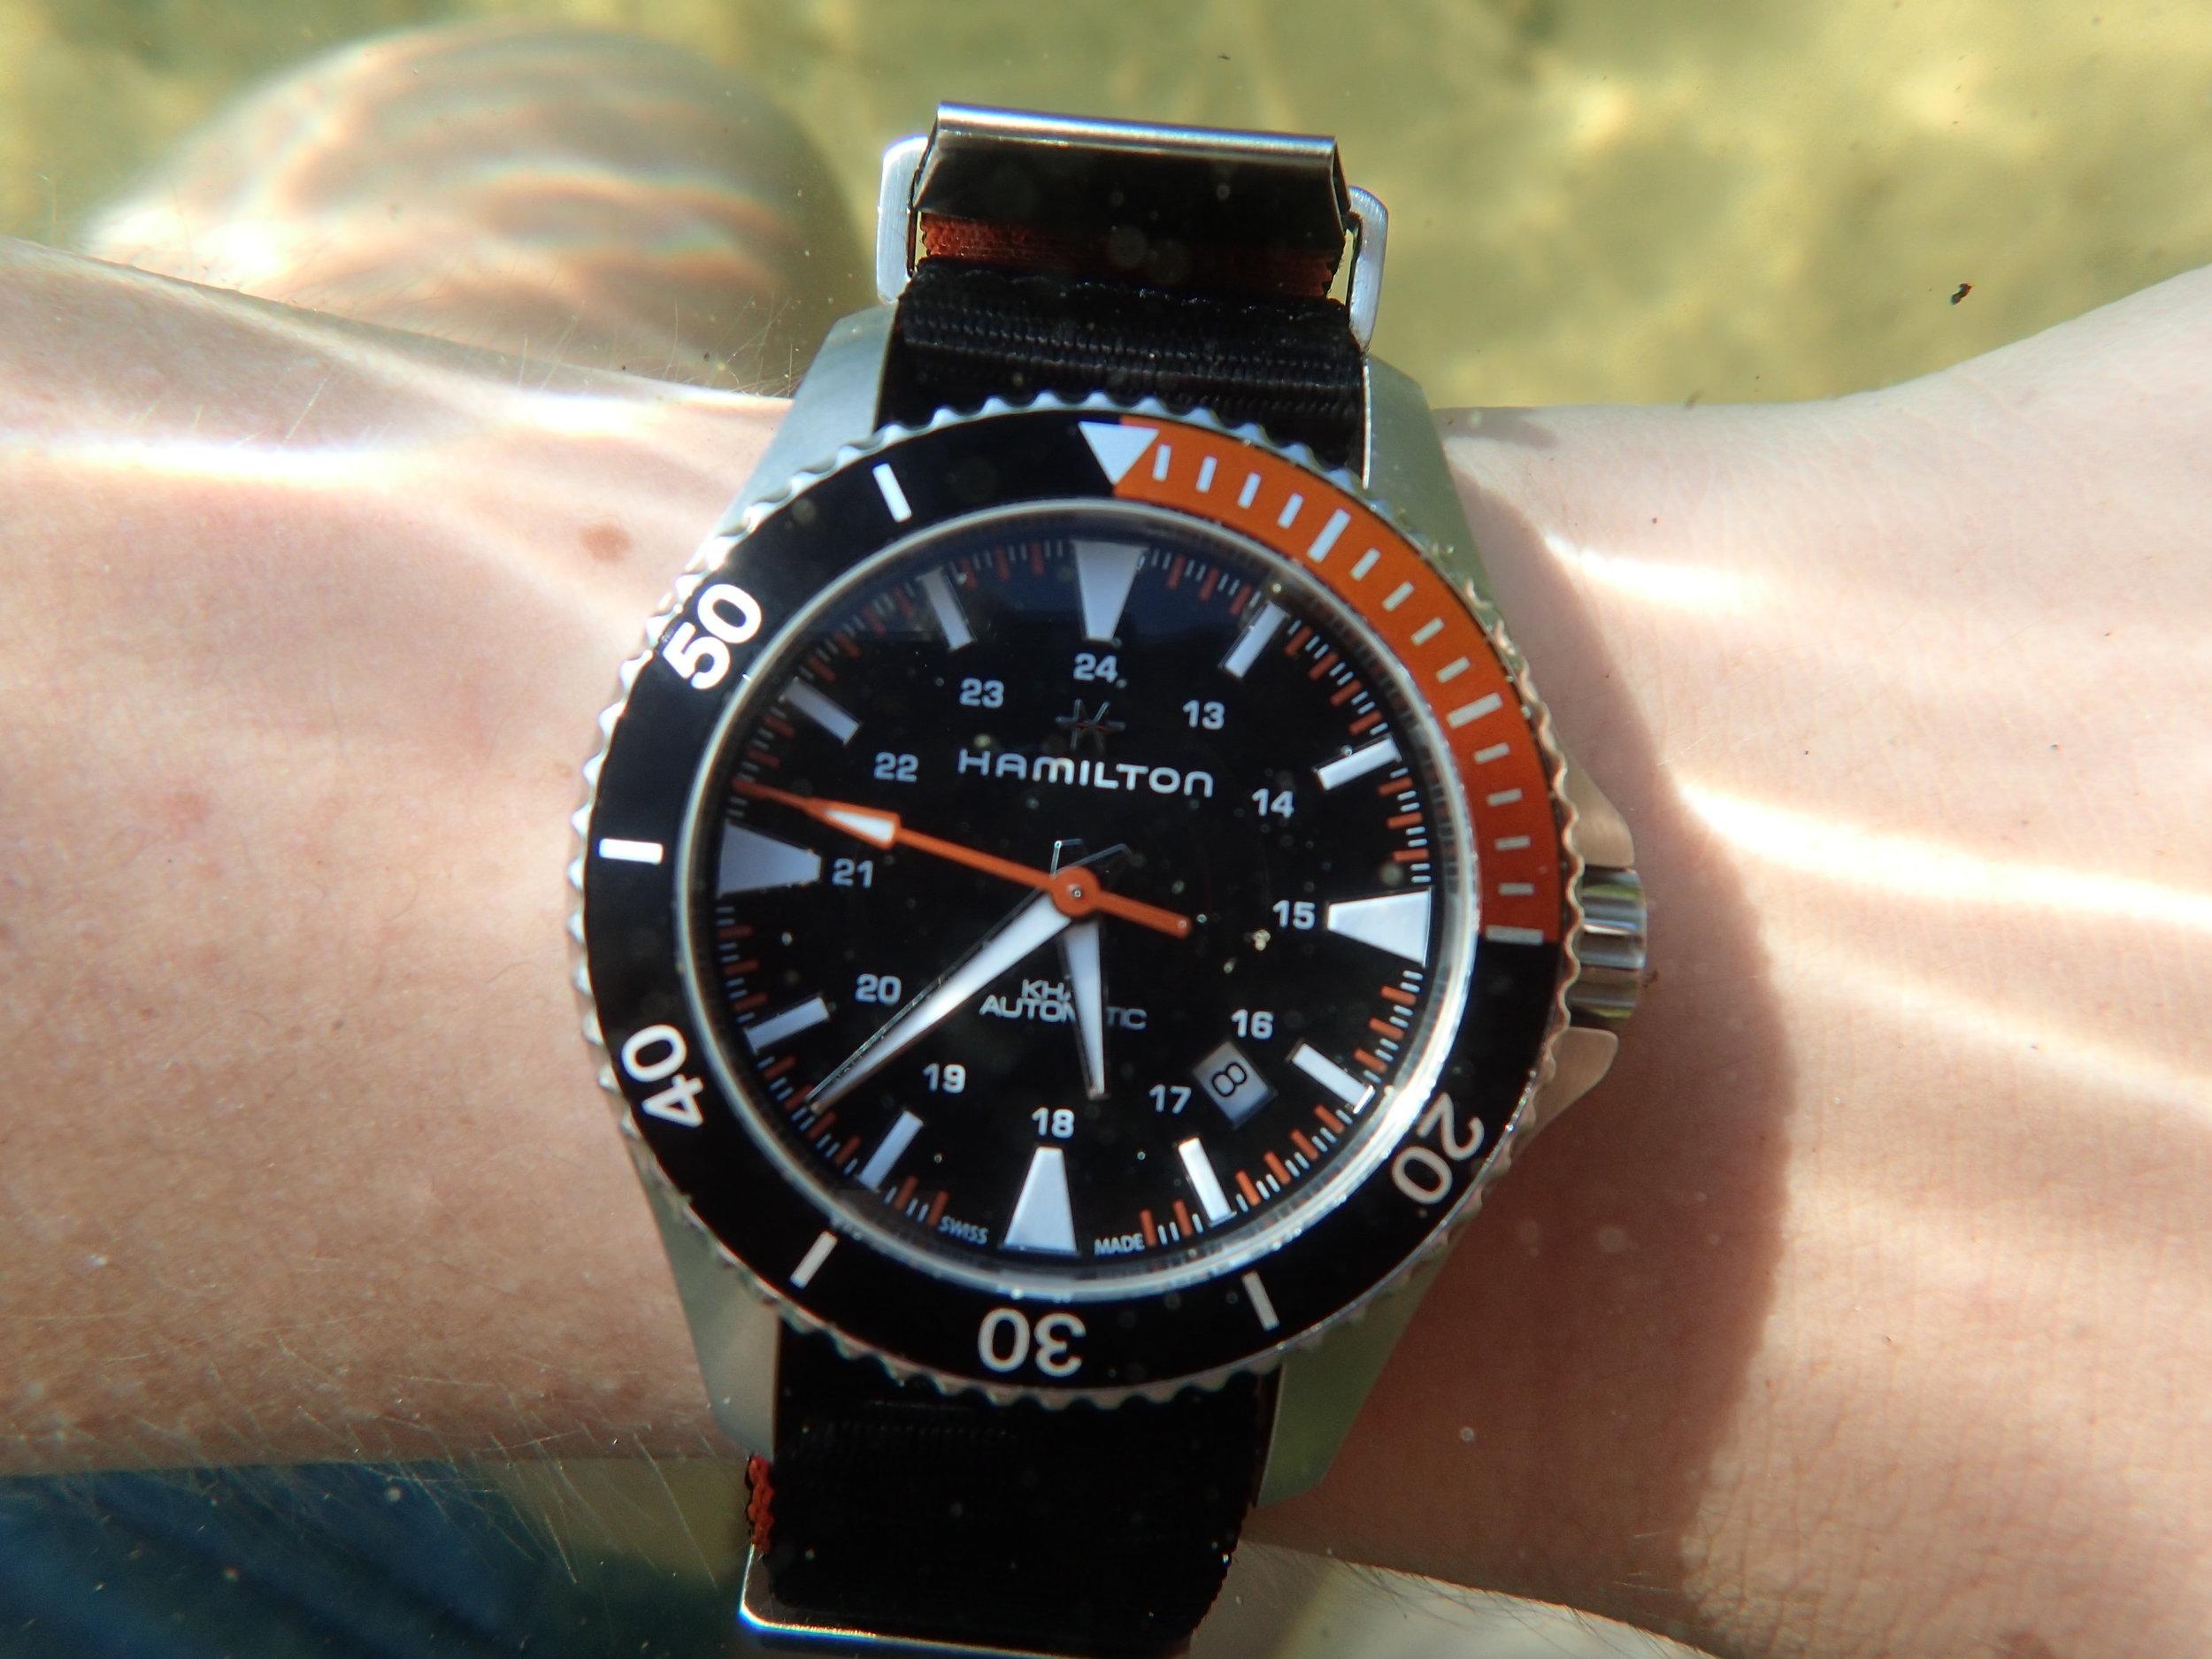 The Hamilton Khaki Scuba underwater. 100 meters of WR is plenty for most folks.